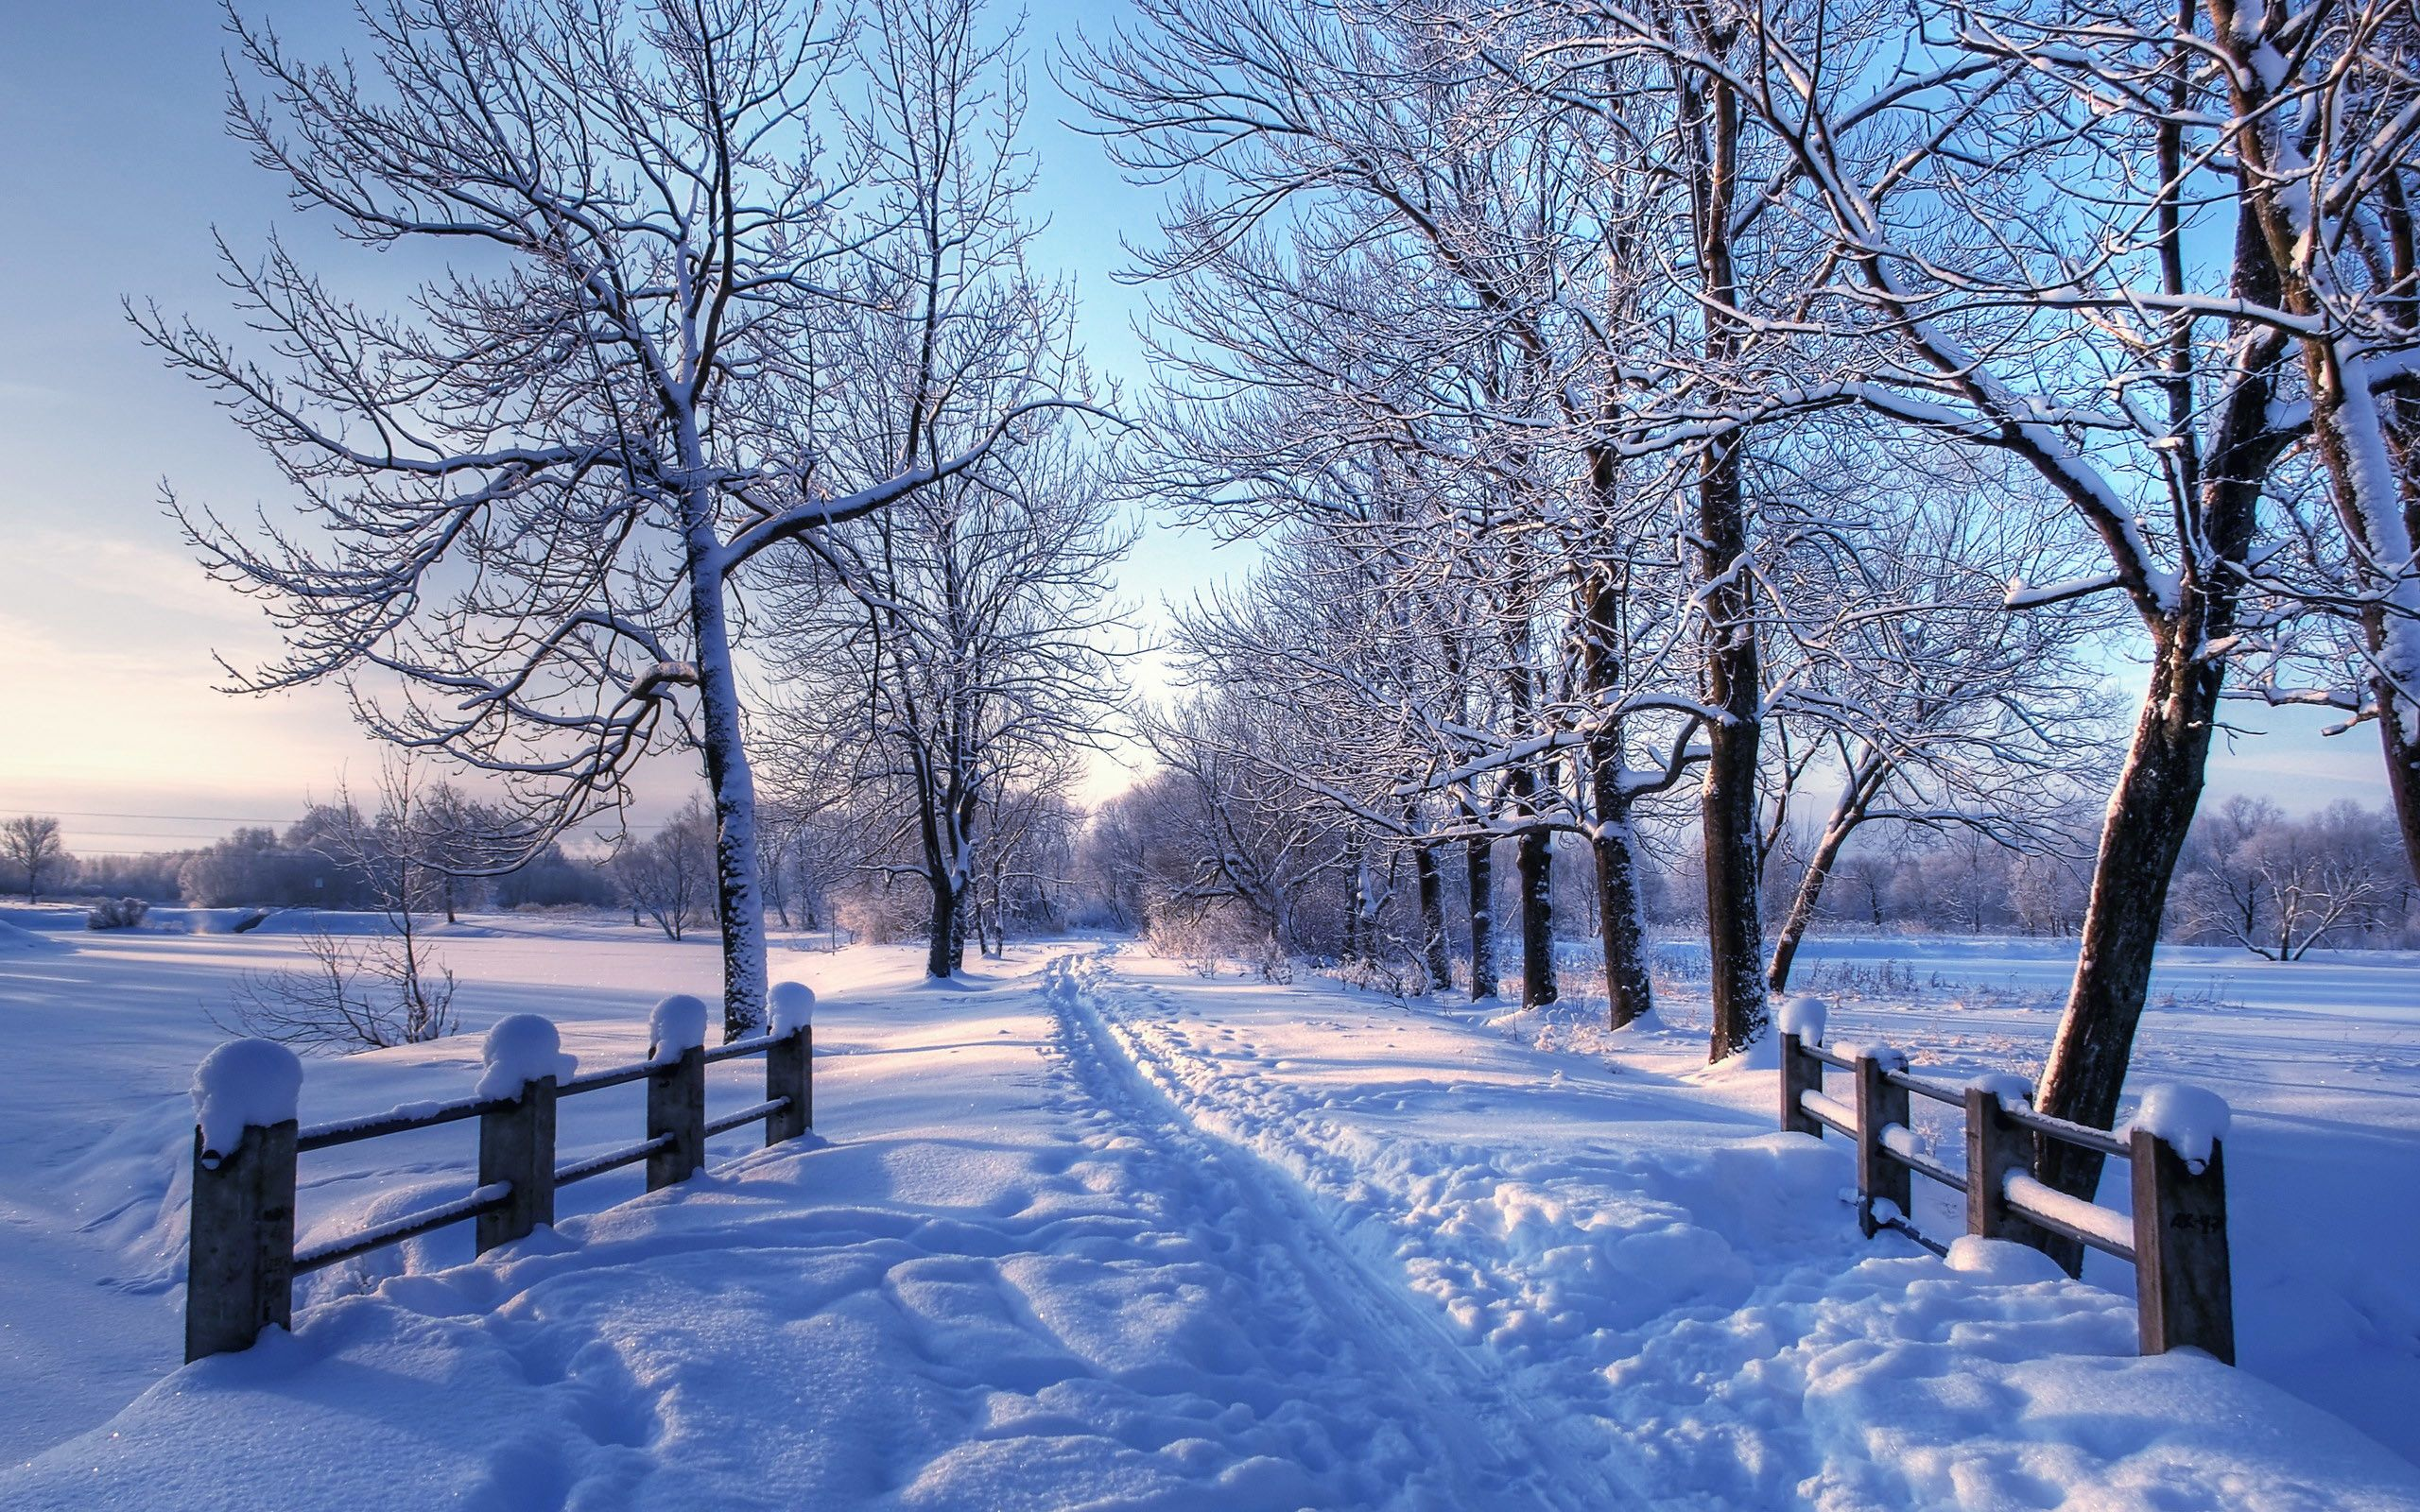 Winter Mac Wallpapers Top Free Winter Mac Backgrounds Wallpaperaccess